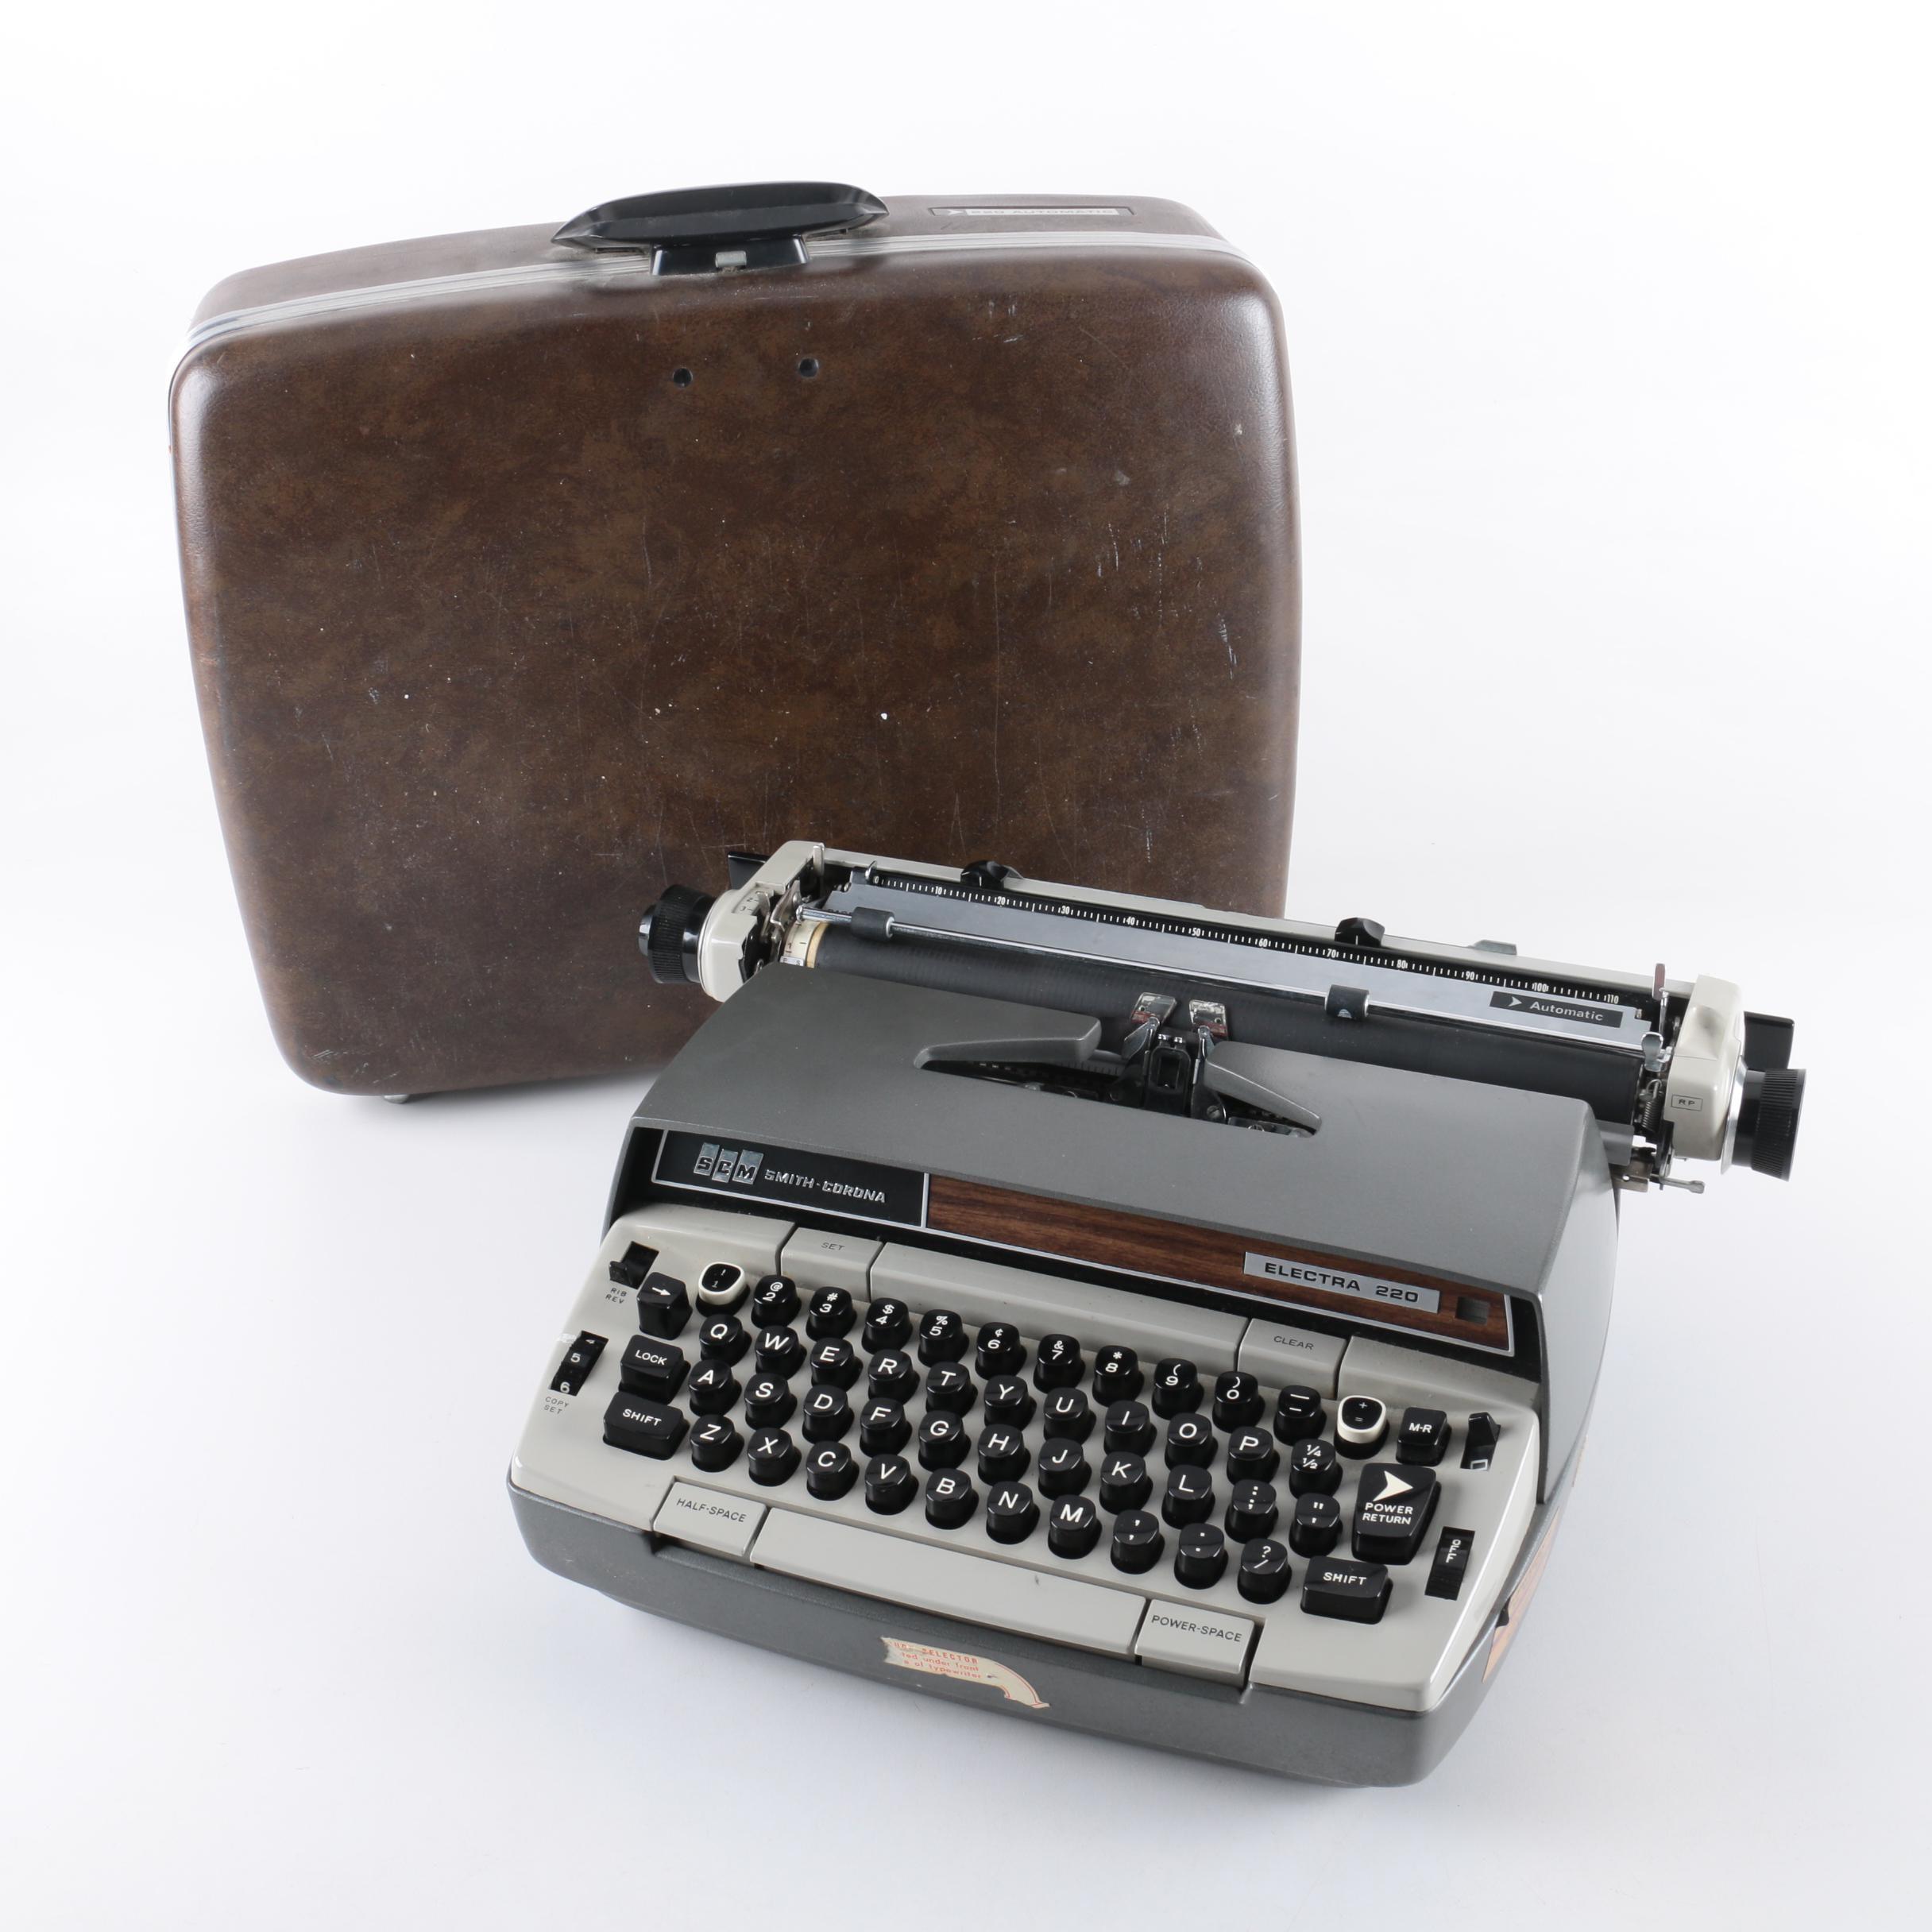 1970s Smith-Corona Electra 220 Automatic Portable Electric Typewriter